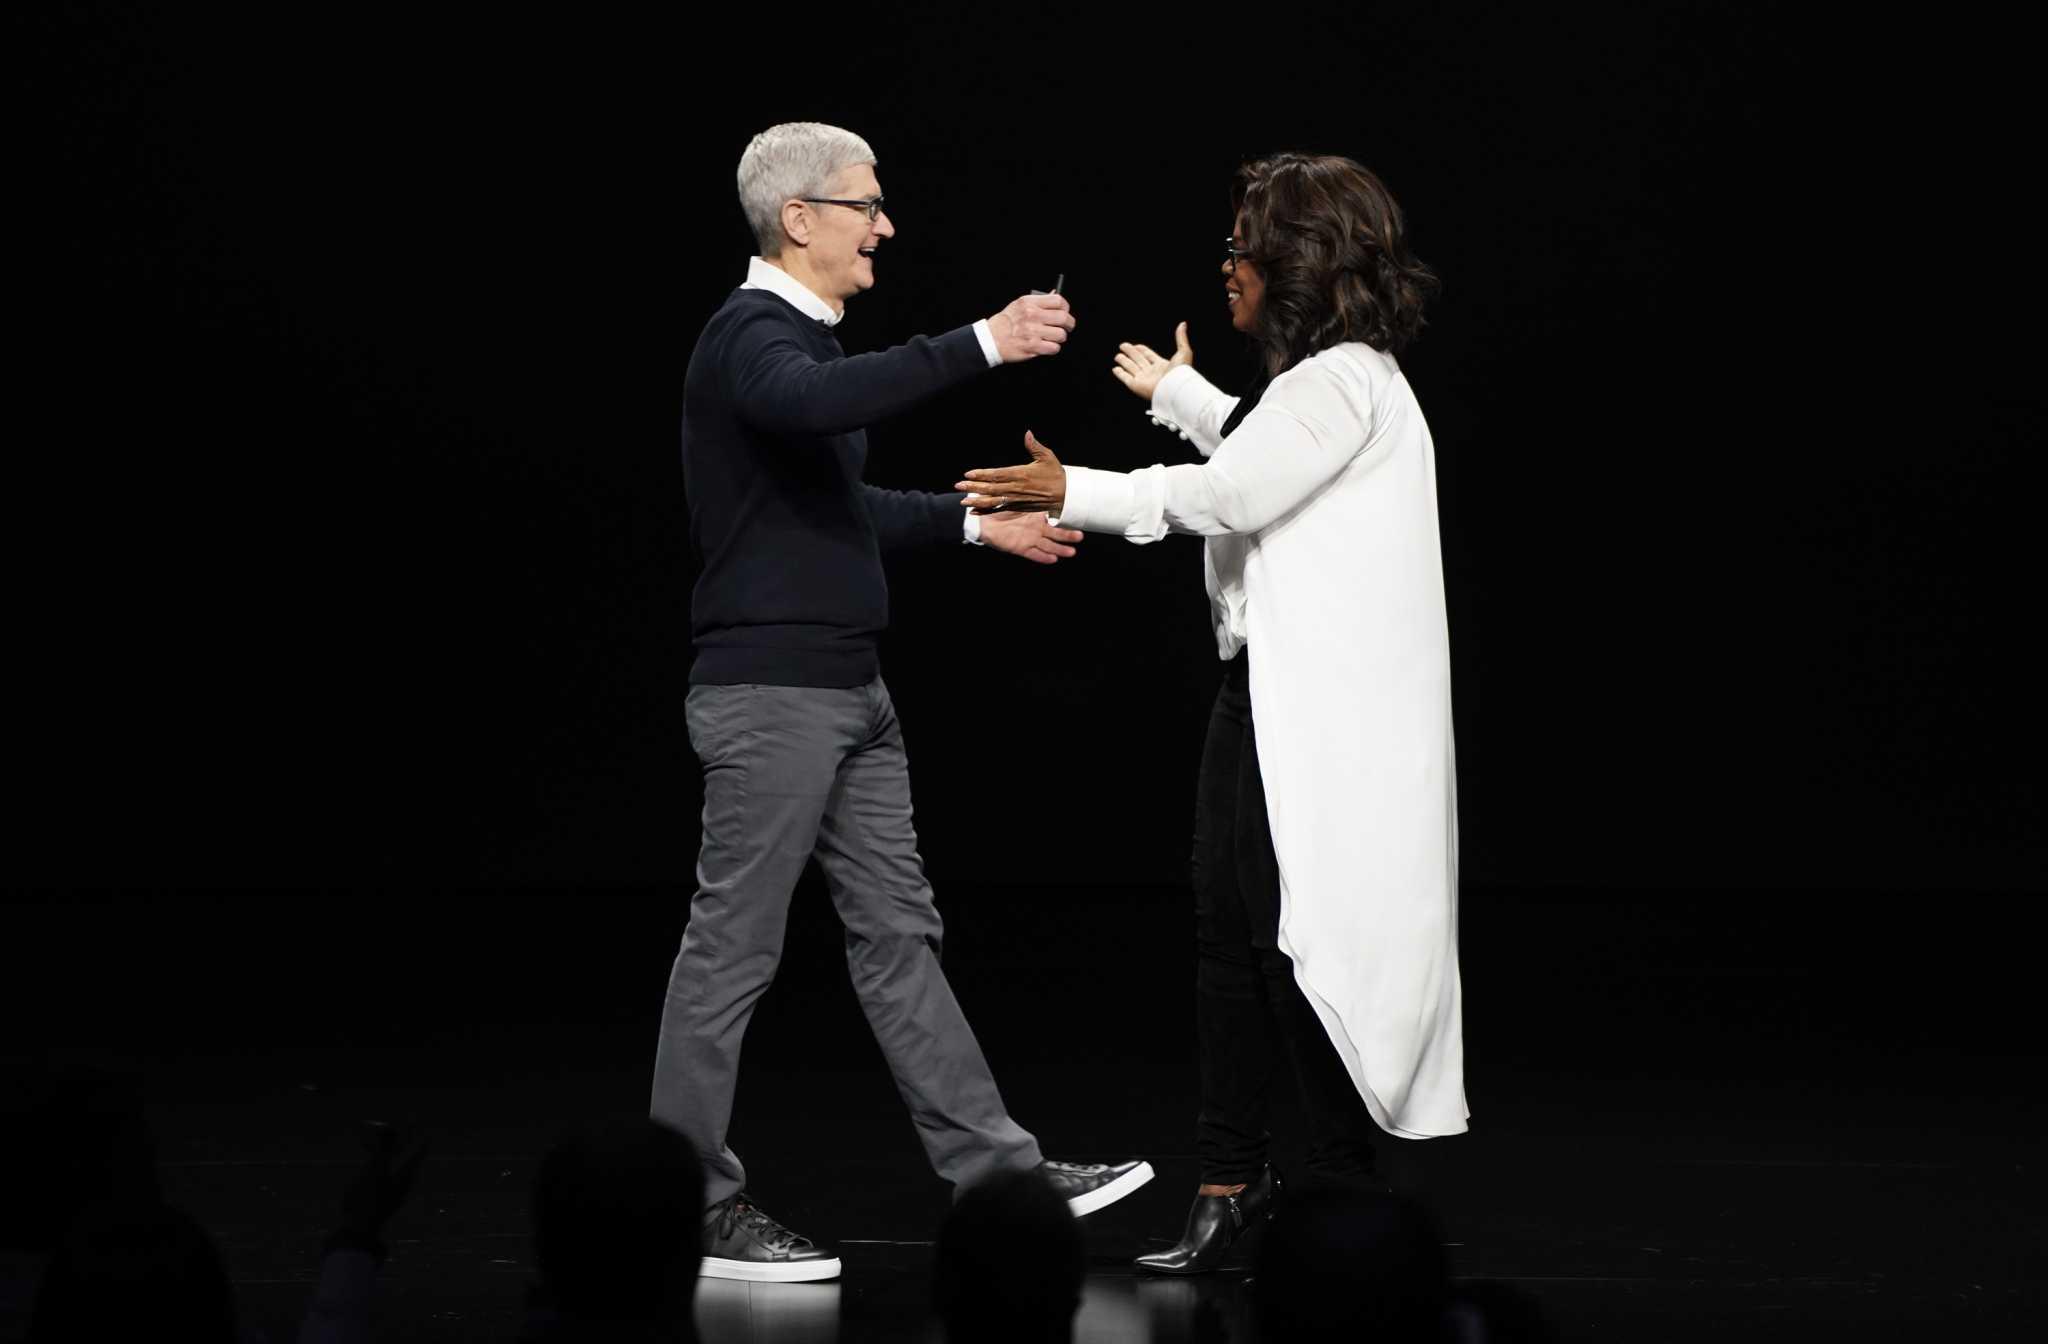 Apple News app crashing on iPhone, iPad, Mac [Updated] - Houston